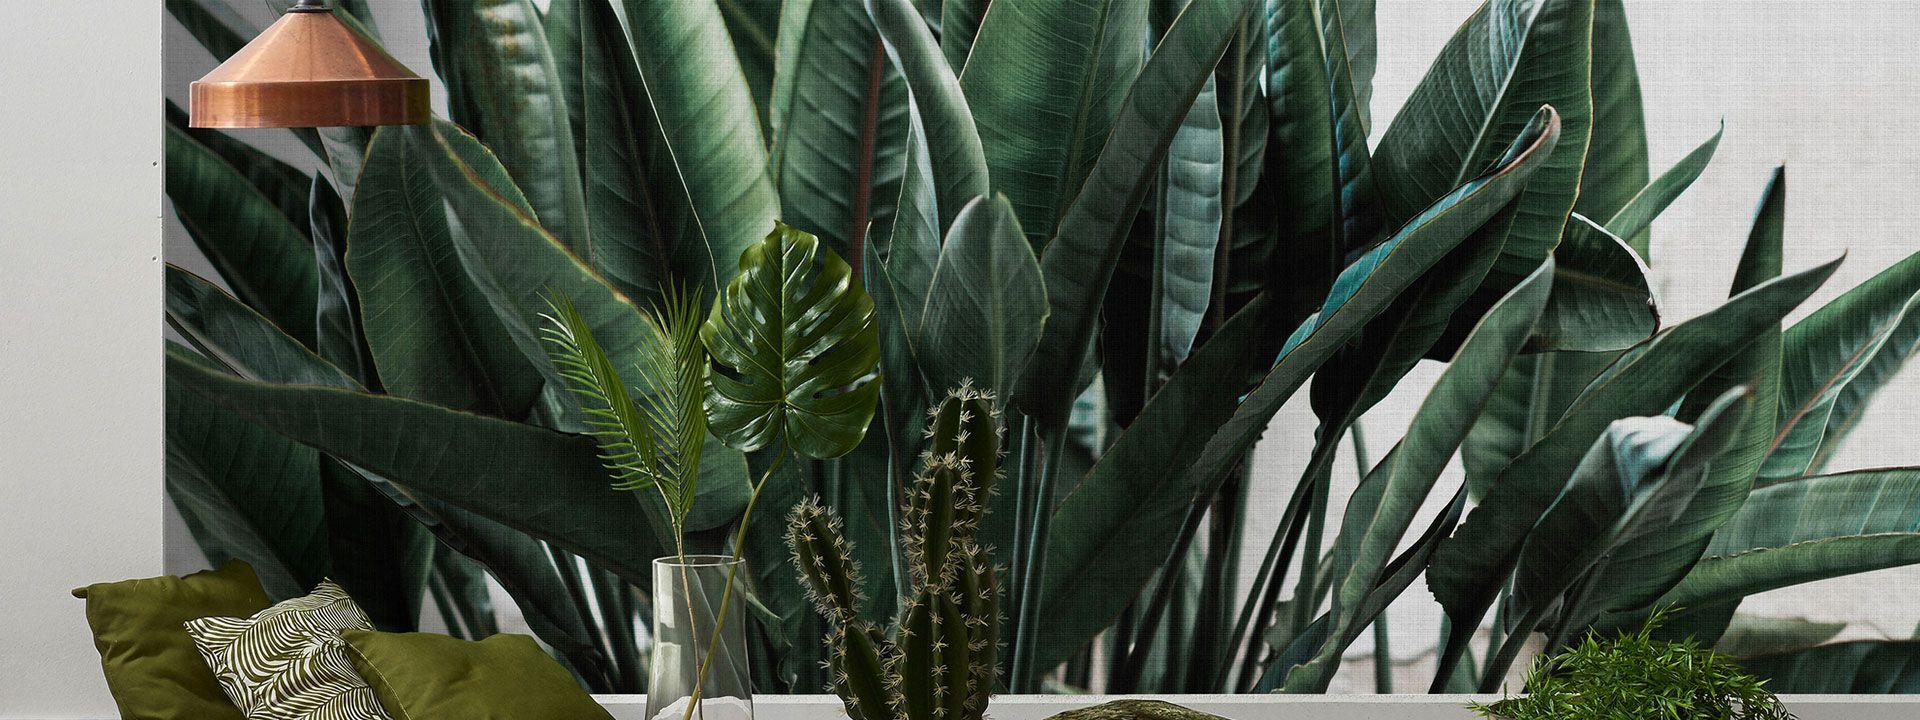 Dschungel Tapeten image